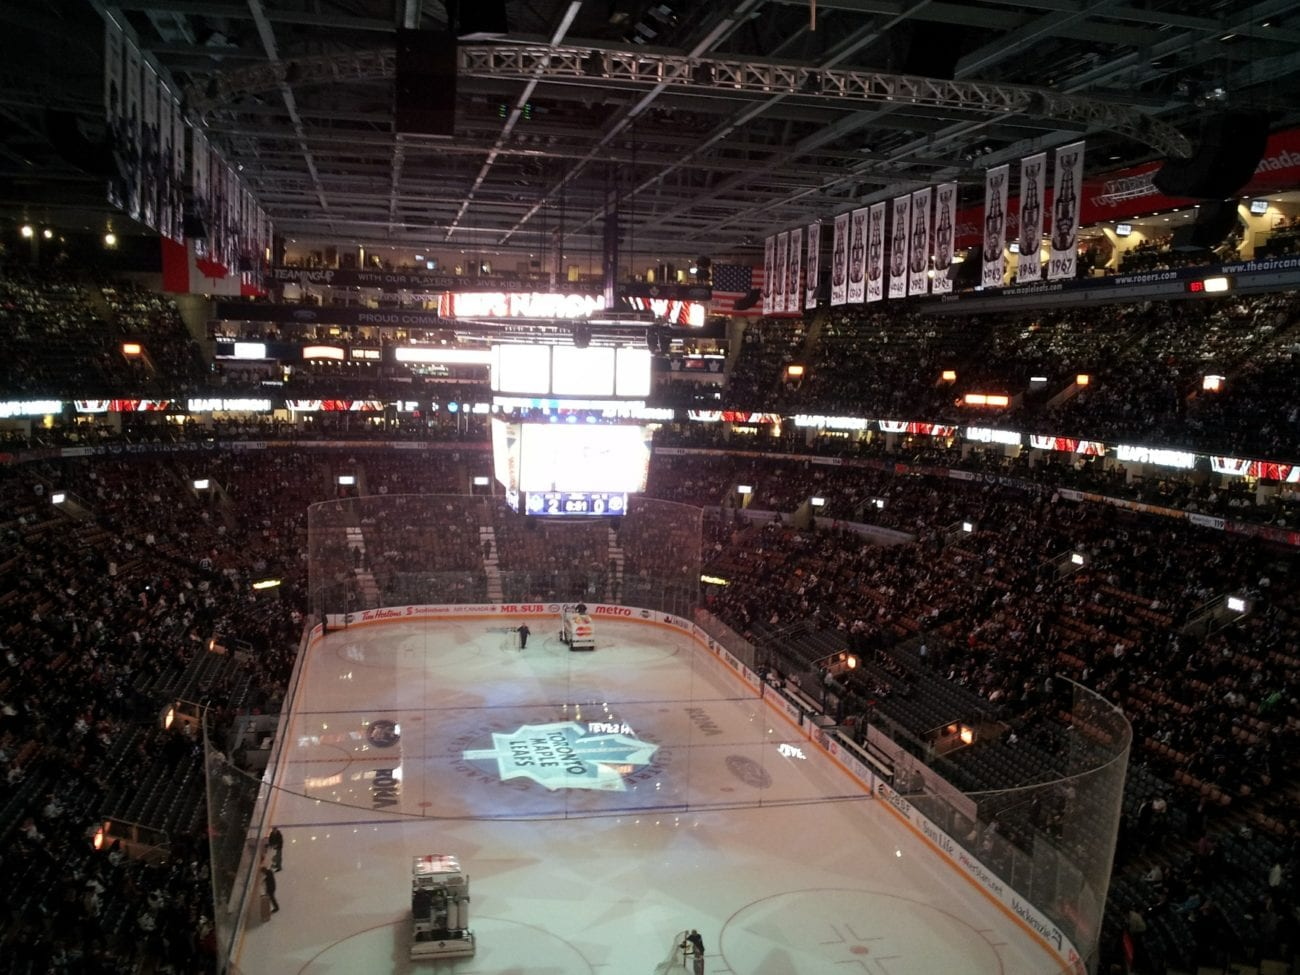 Ice hockey arena NHL Toronto Maple Leaves